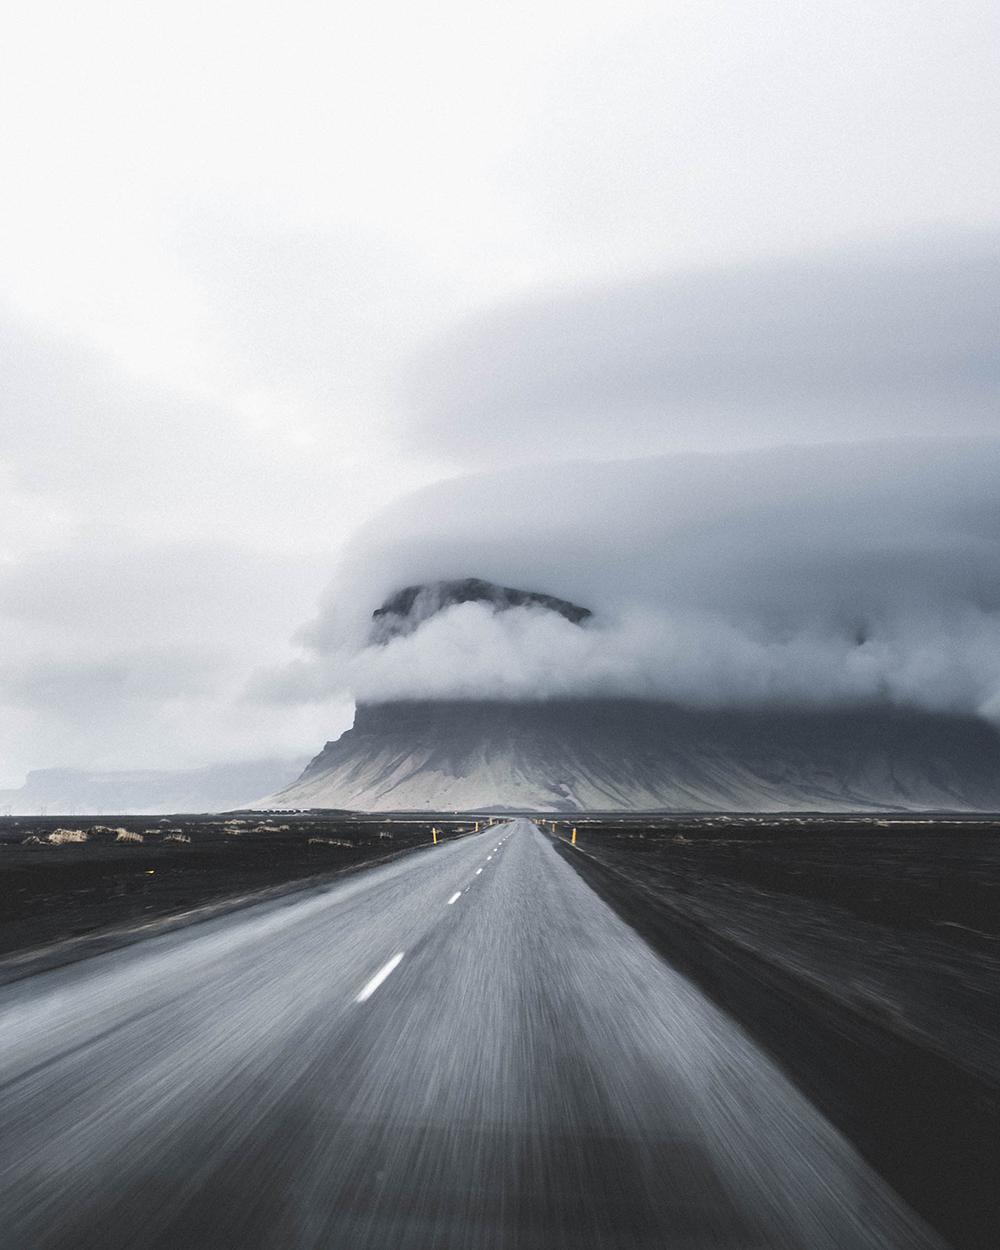 Lómagnúpur Mountain Drive | Hidden Iceland | Photo by Norris Niman